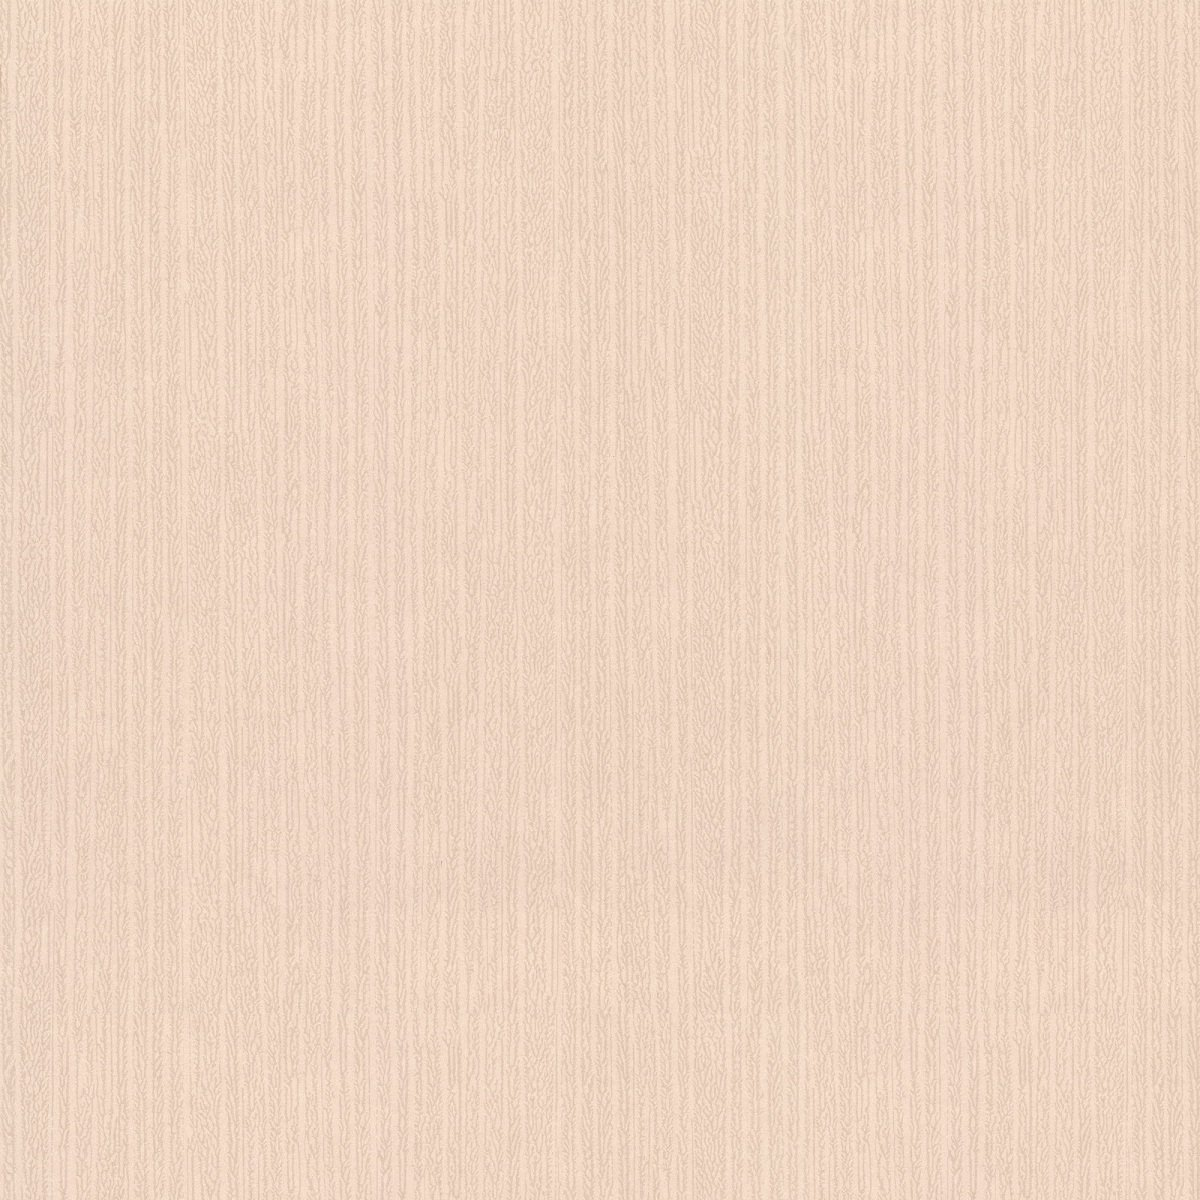 Обои Wallquest Vivaldi B03254/11, интернет магазин Волео